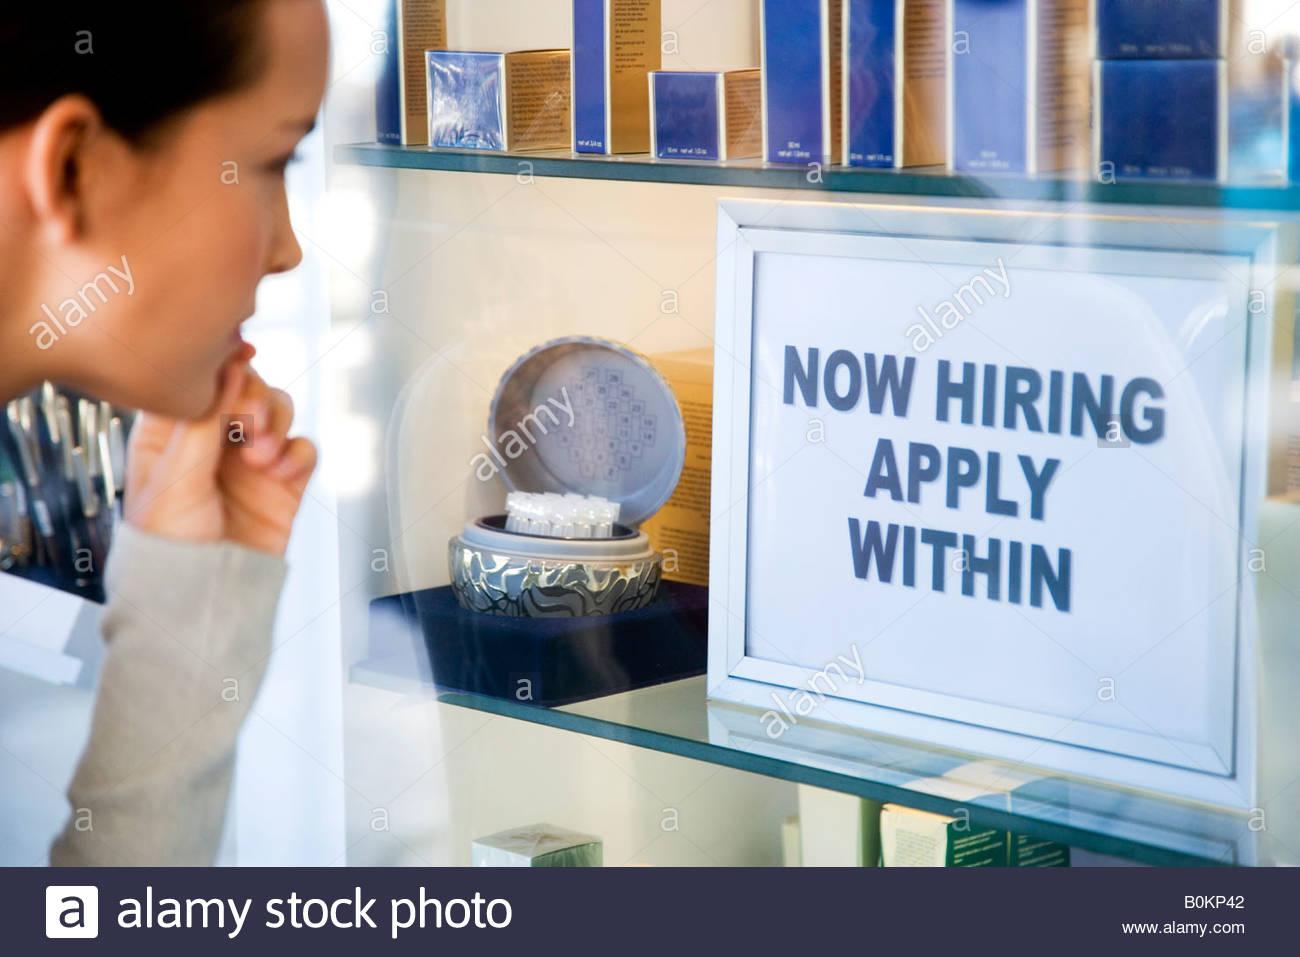 Woman looking at job advert in shop window - Stock Image